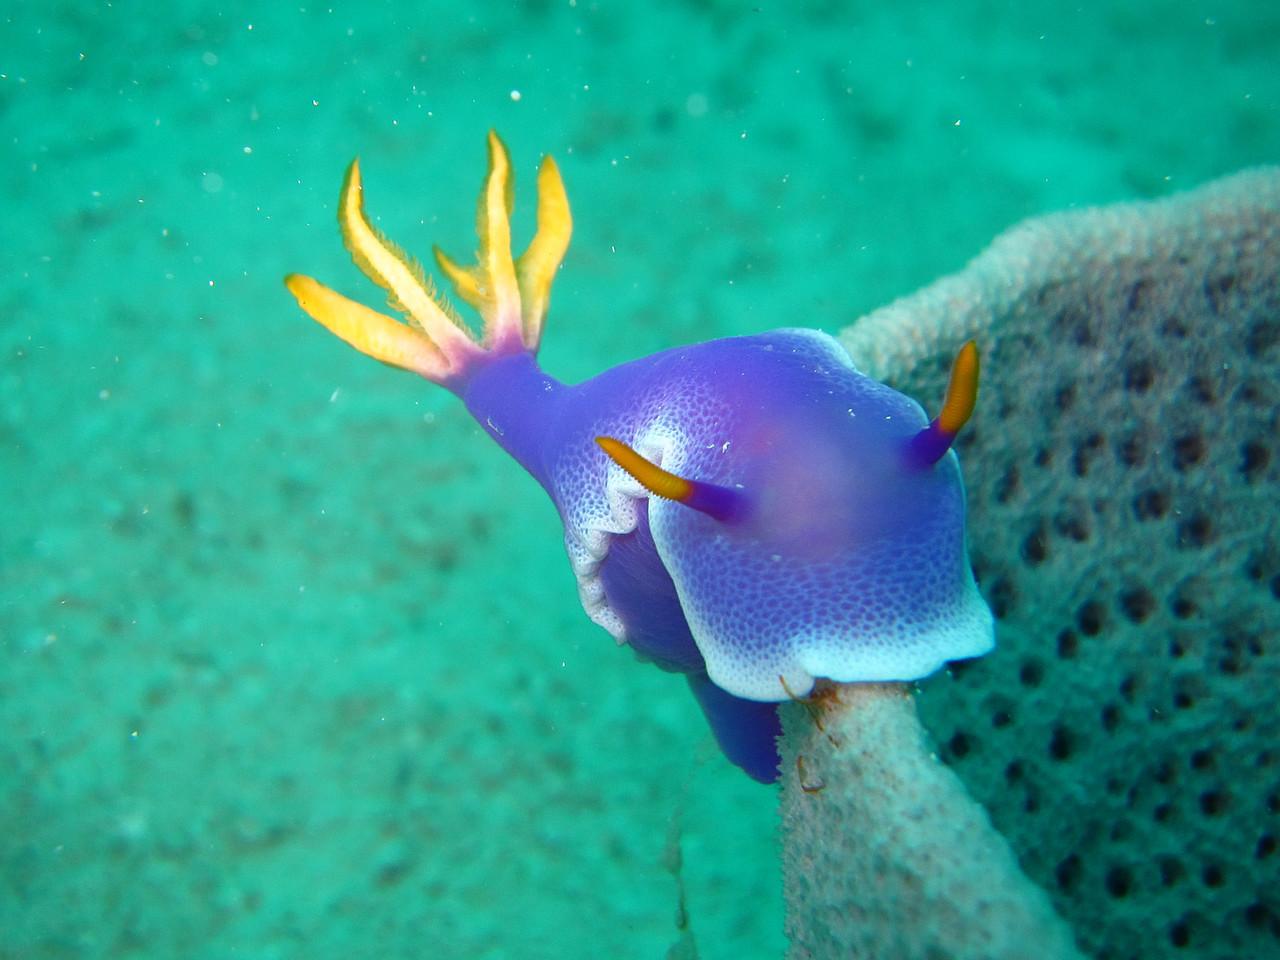 A Giant Hypselodoris nudibranch surmounting a coral wall.